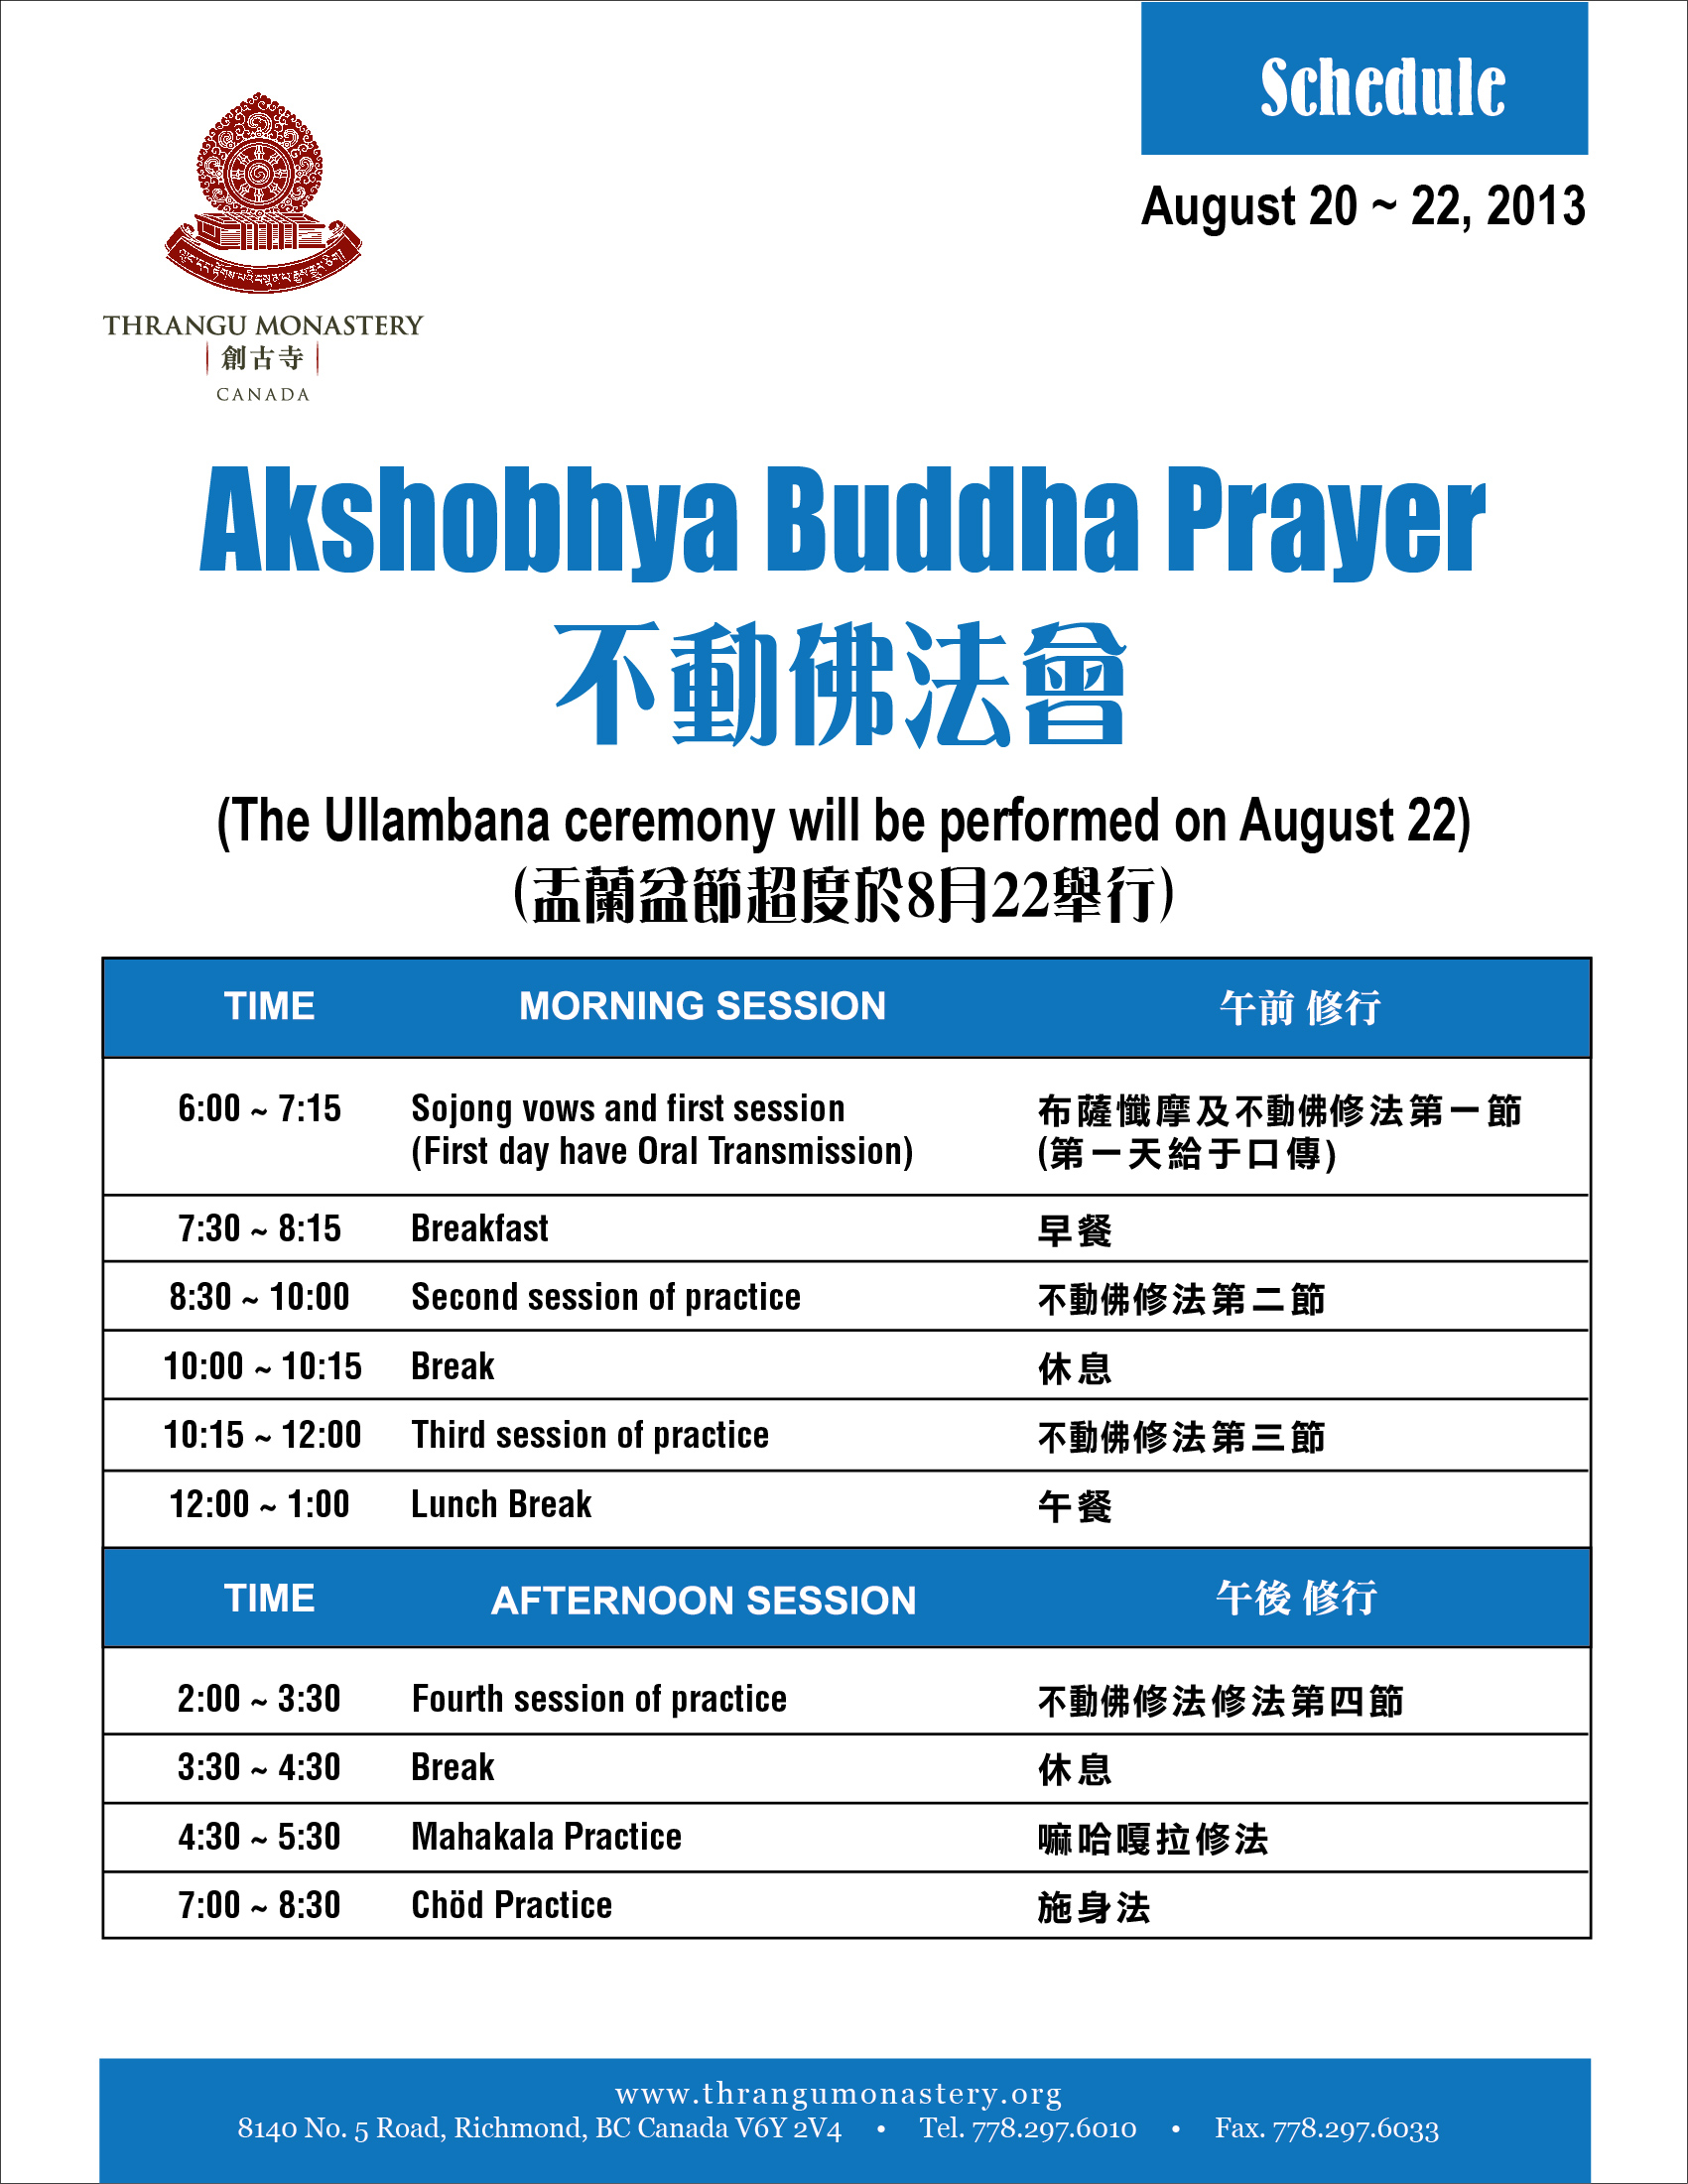 Akshobhya Buddha Prayer – August 20 through 22, 2013 / (The